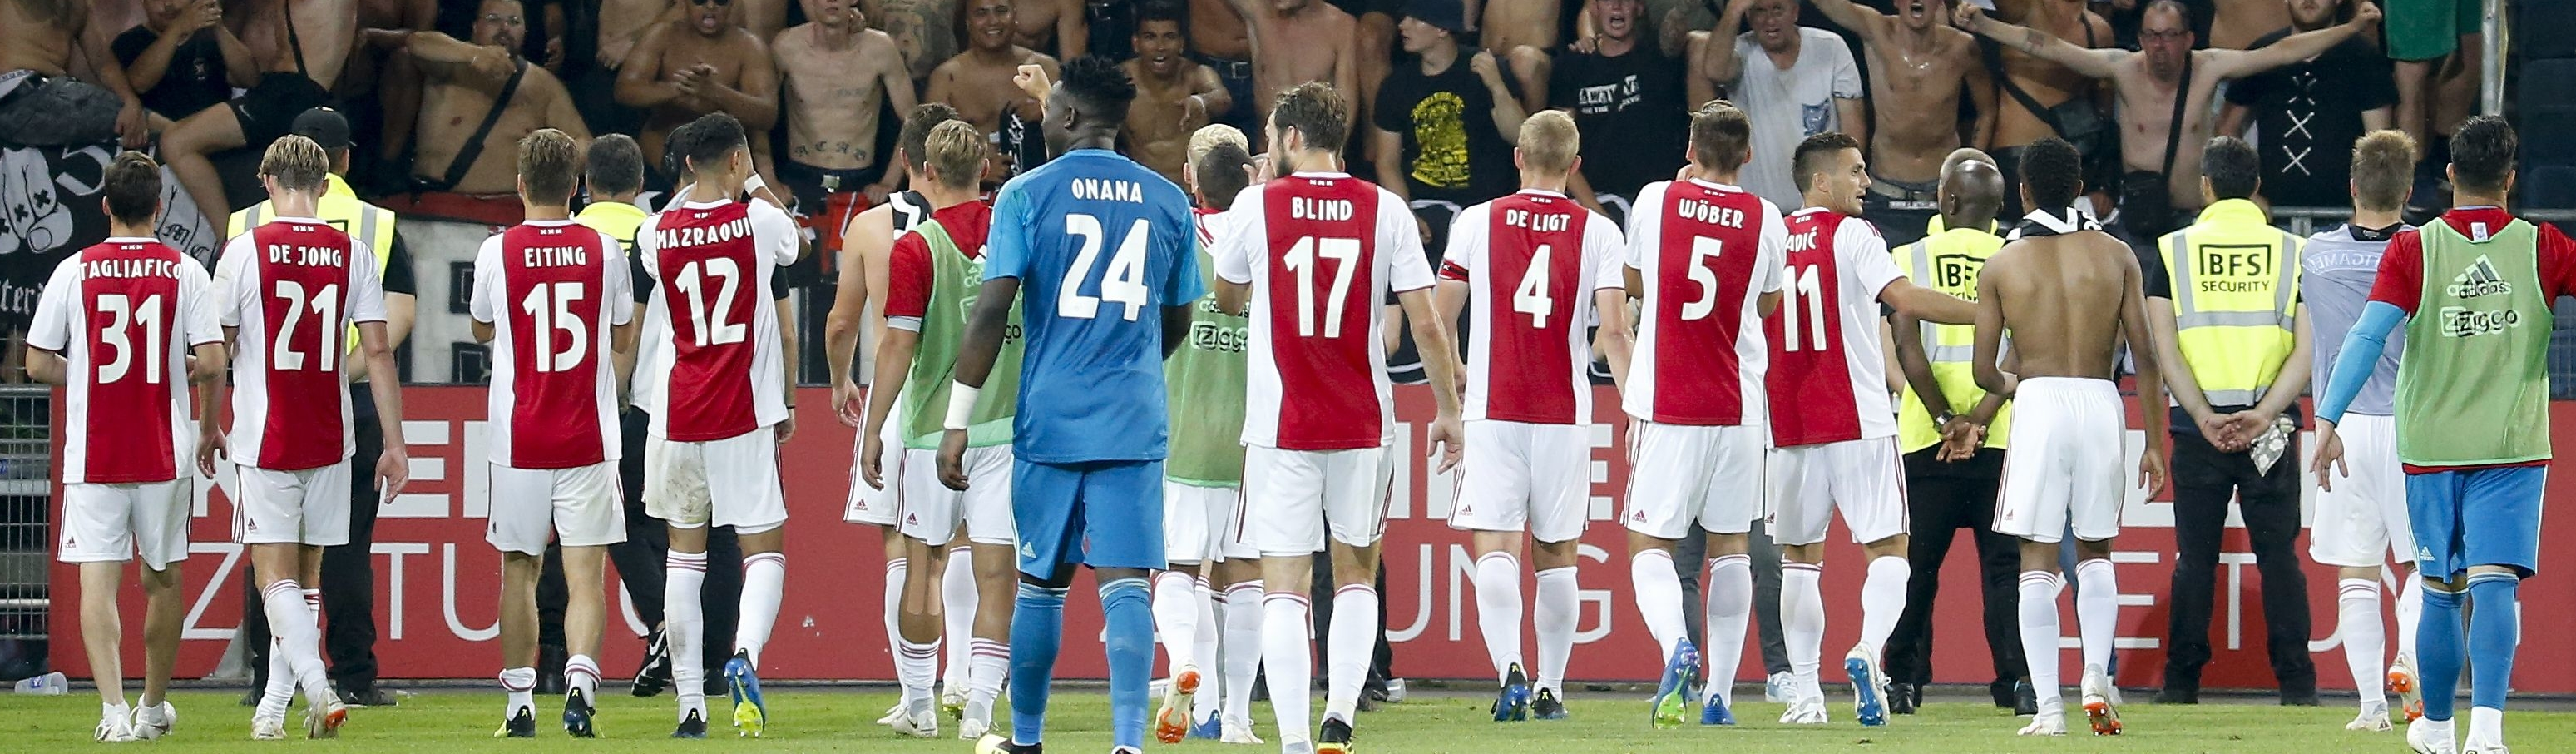 Ajax-Paok: i Lancieri per non perdere la Champions